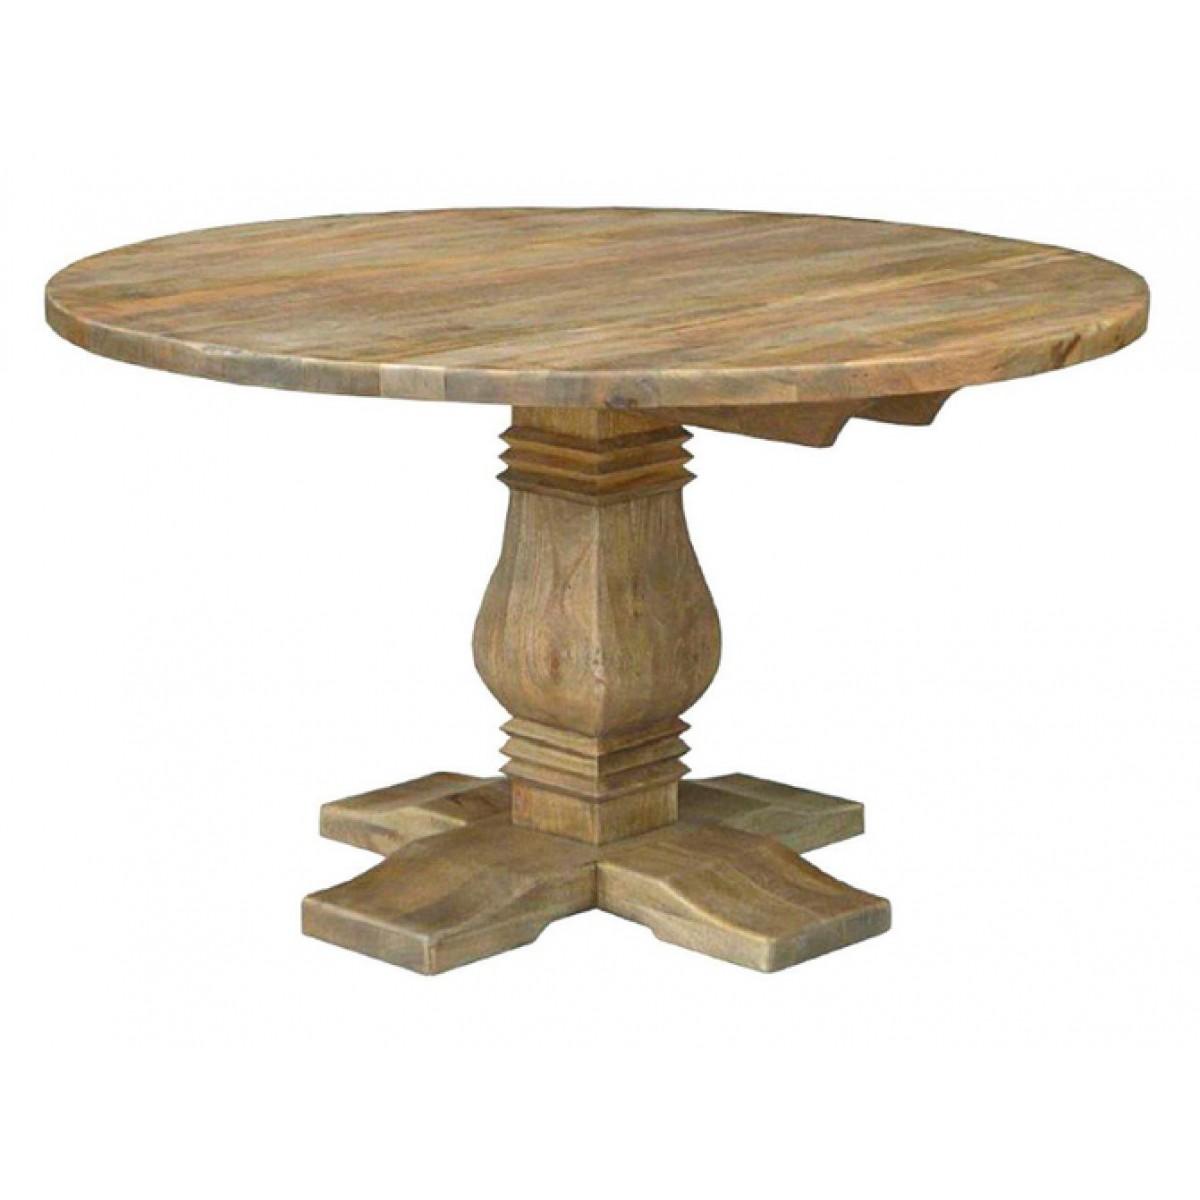 Mesa de comedor rústica redonda madera de Giner y Colomer - GODIN.